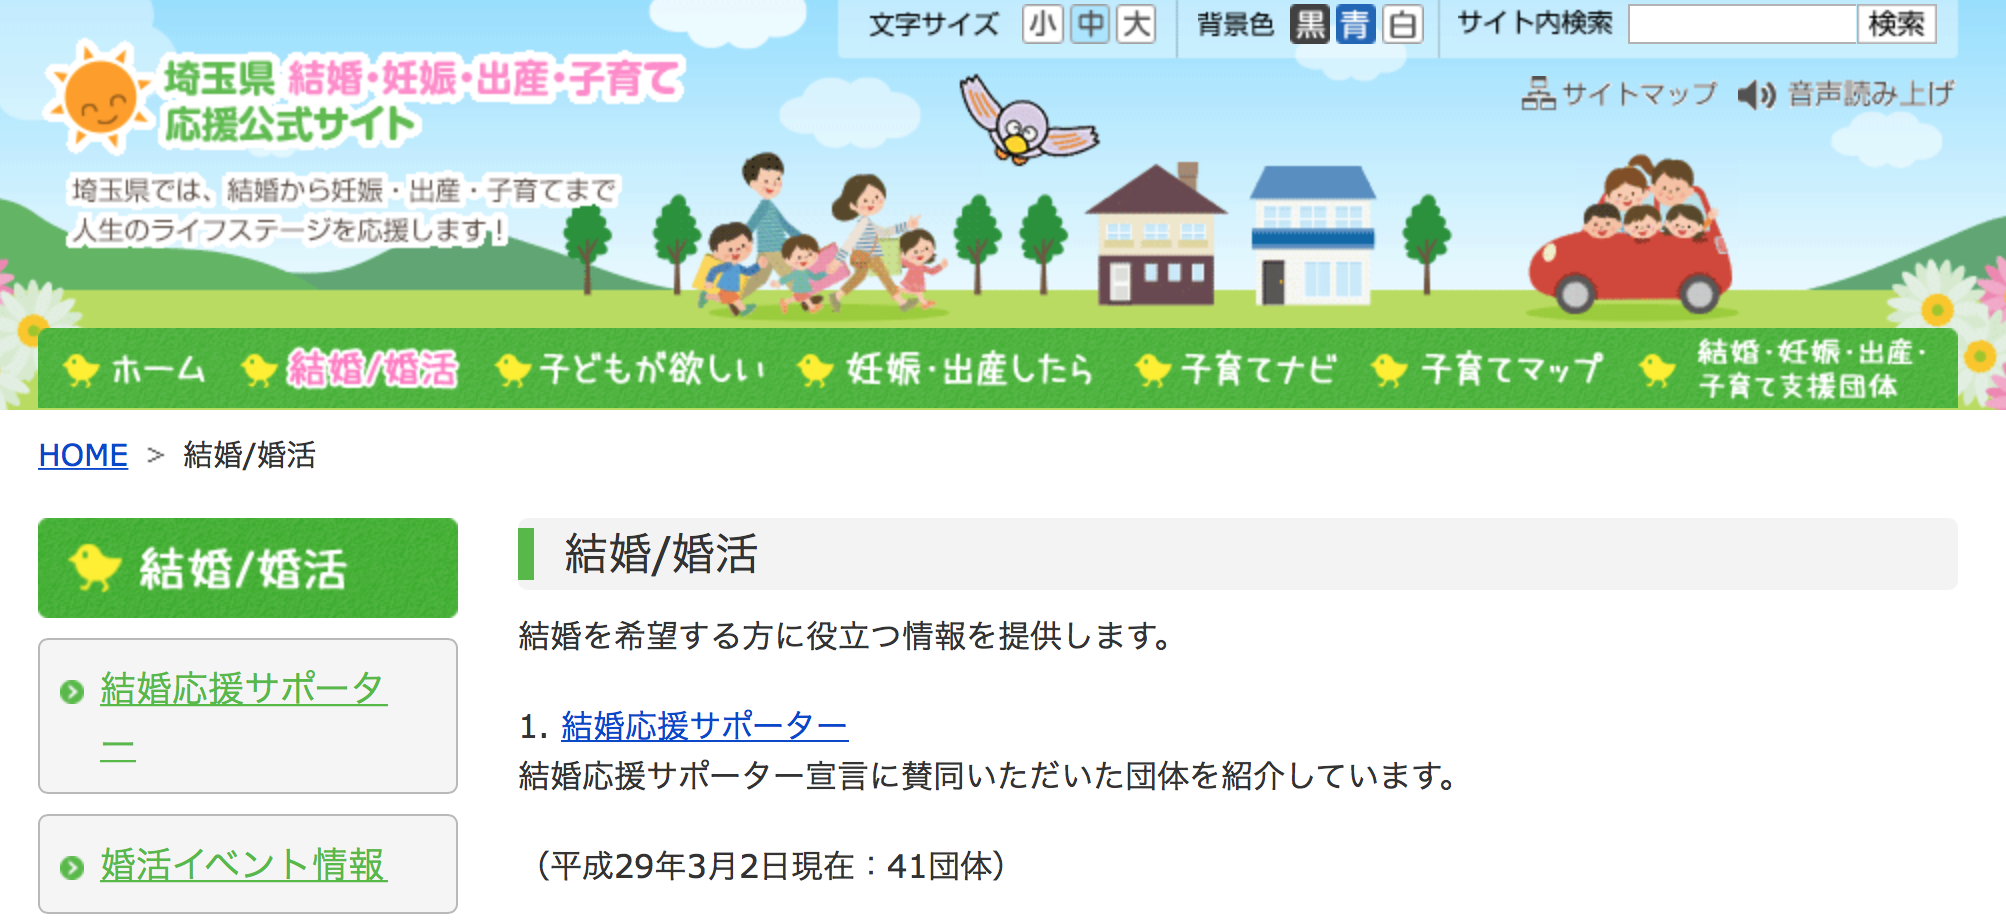 埼玉県 結婚・妊娠・出産・子育て応援公式サイト